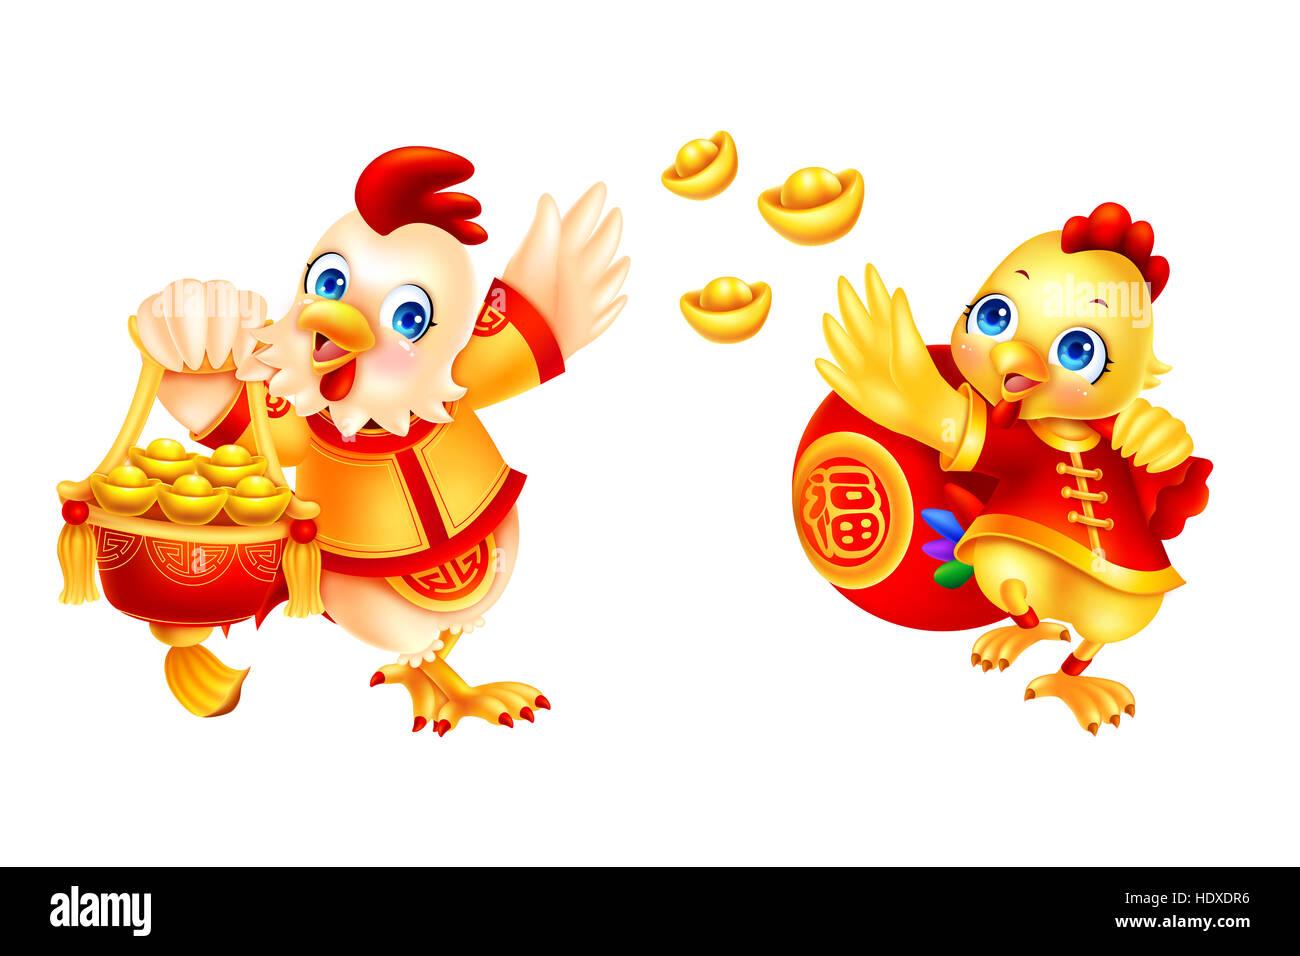 Illustration chicken - Stock Image